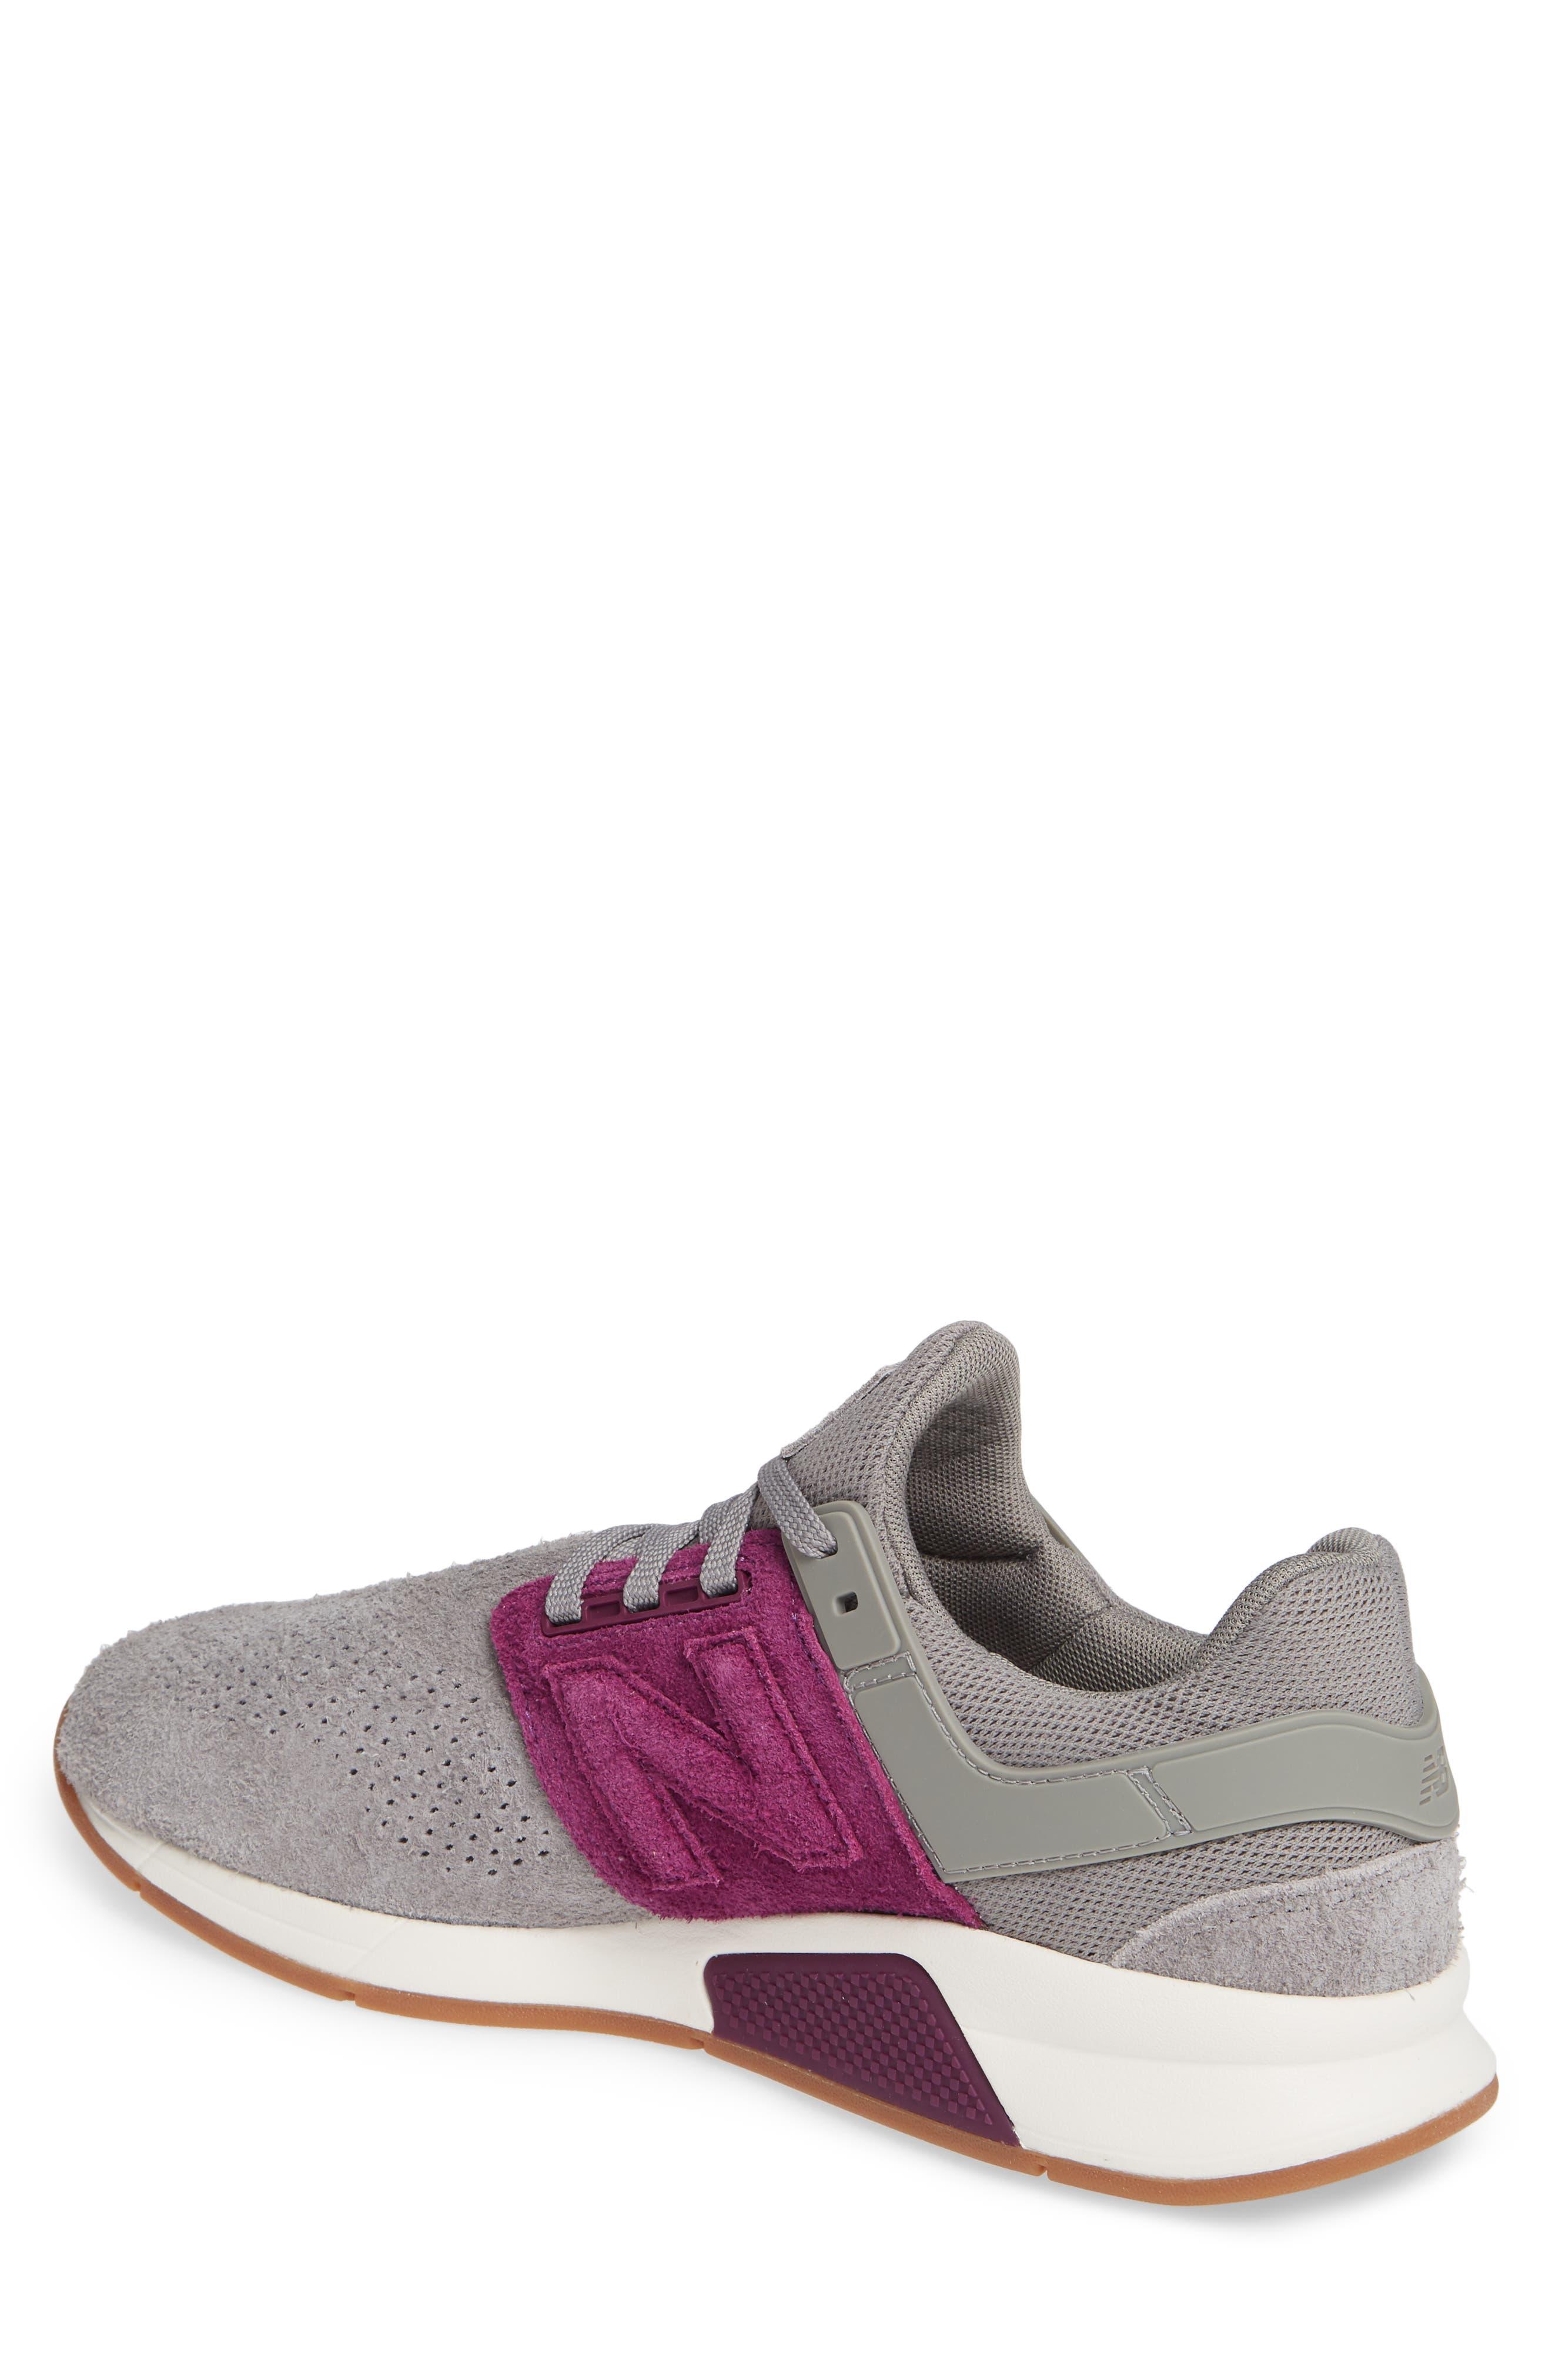 247 Suede Sneaker,                             Alternate thumbnail 2, color,                             MARBLEHEAD SUEDE